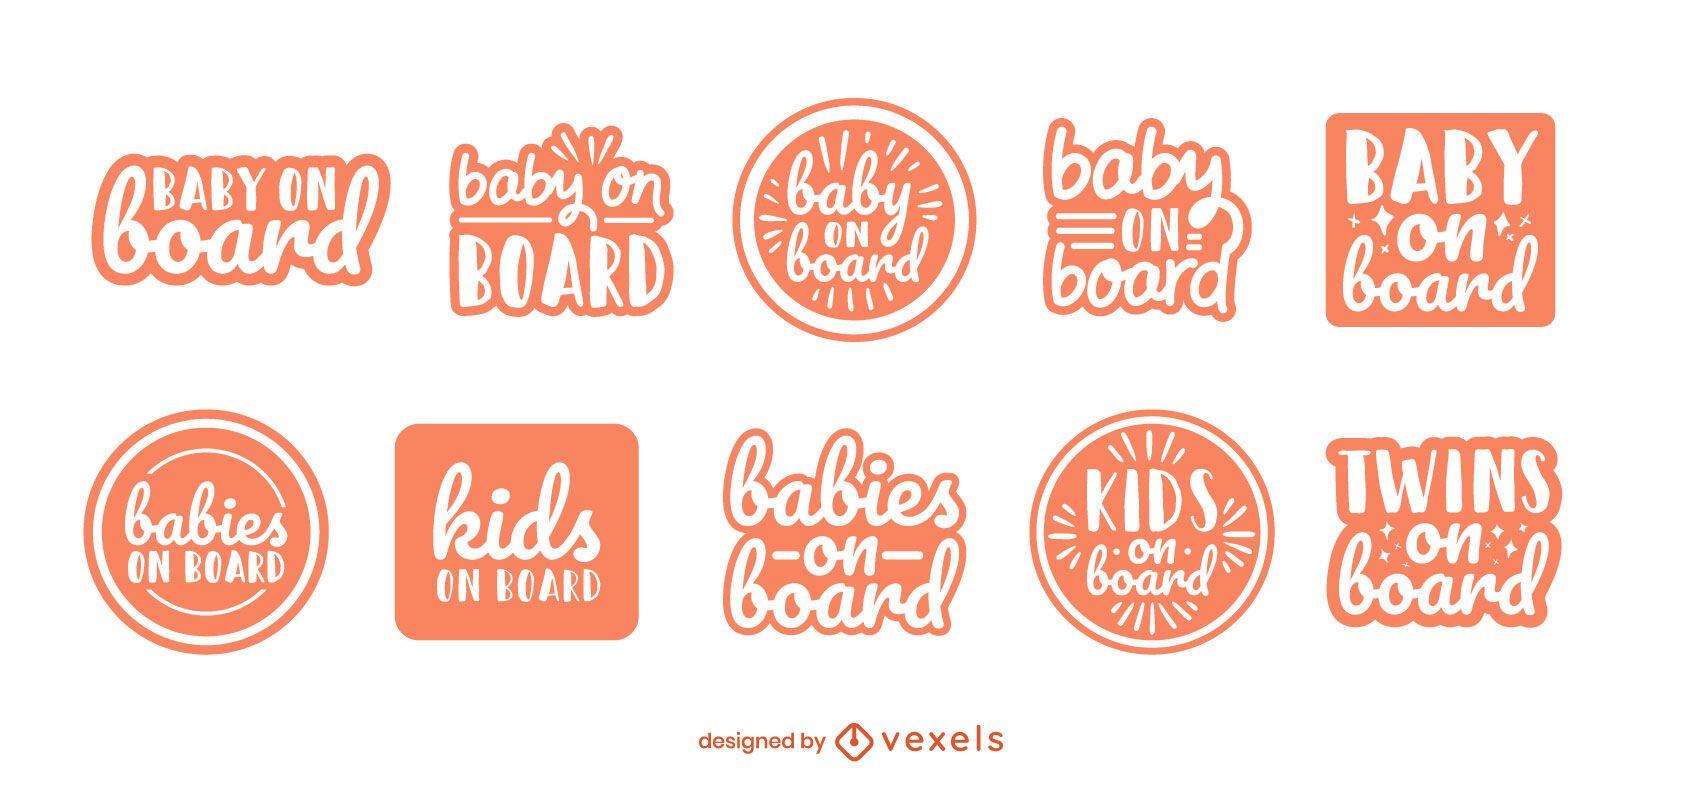 Baby on board badge set